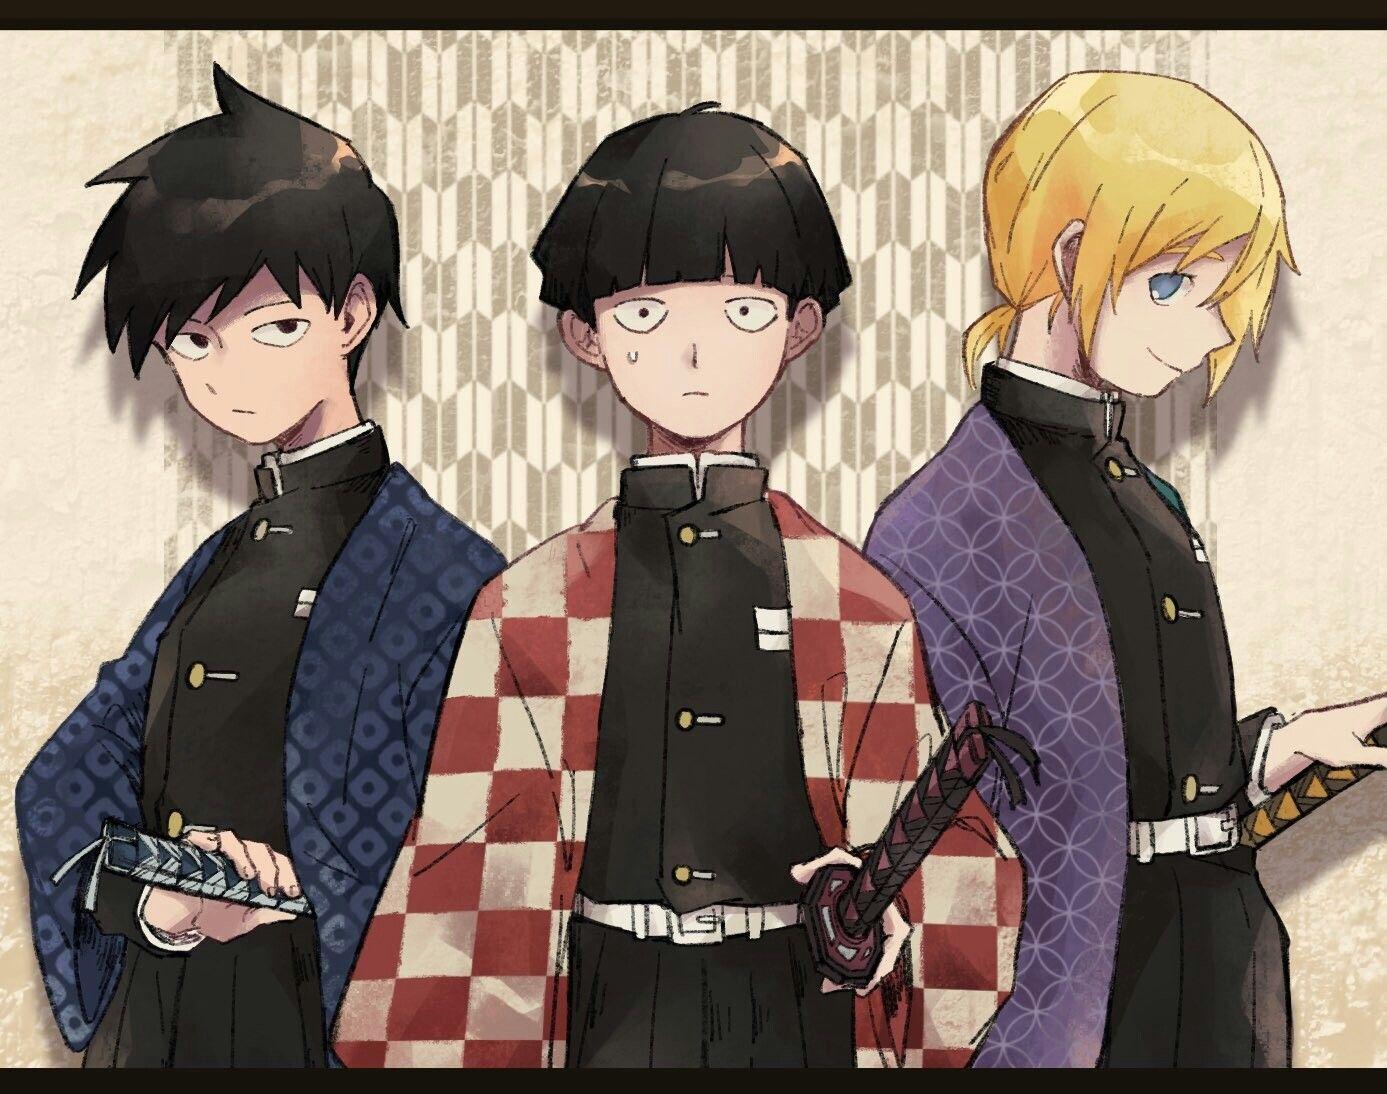 mob psycho 100 x kimetsu no yaiba mob psycho 100 anime mob physco 100 mob psycho 100